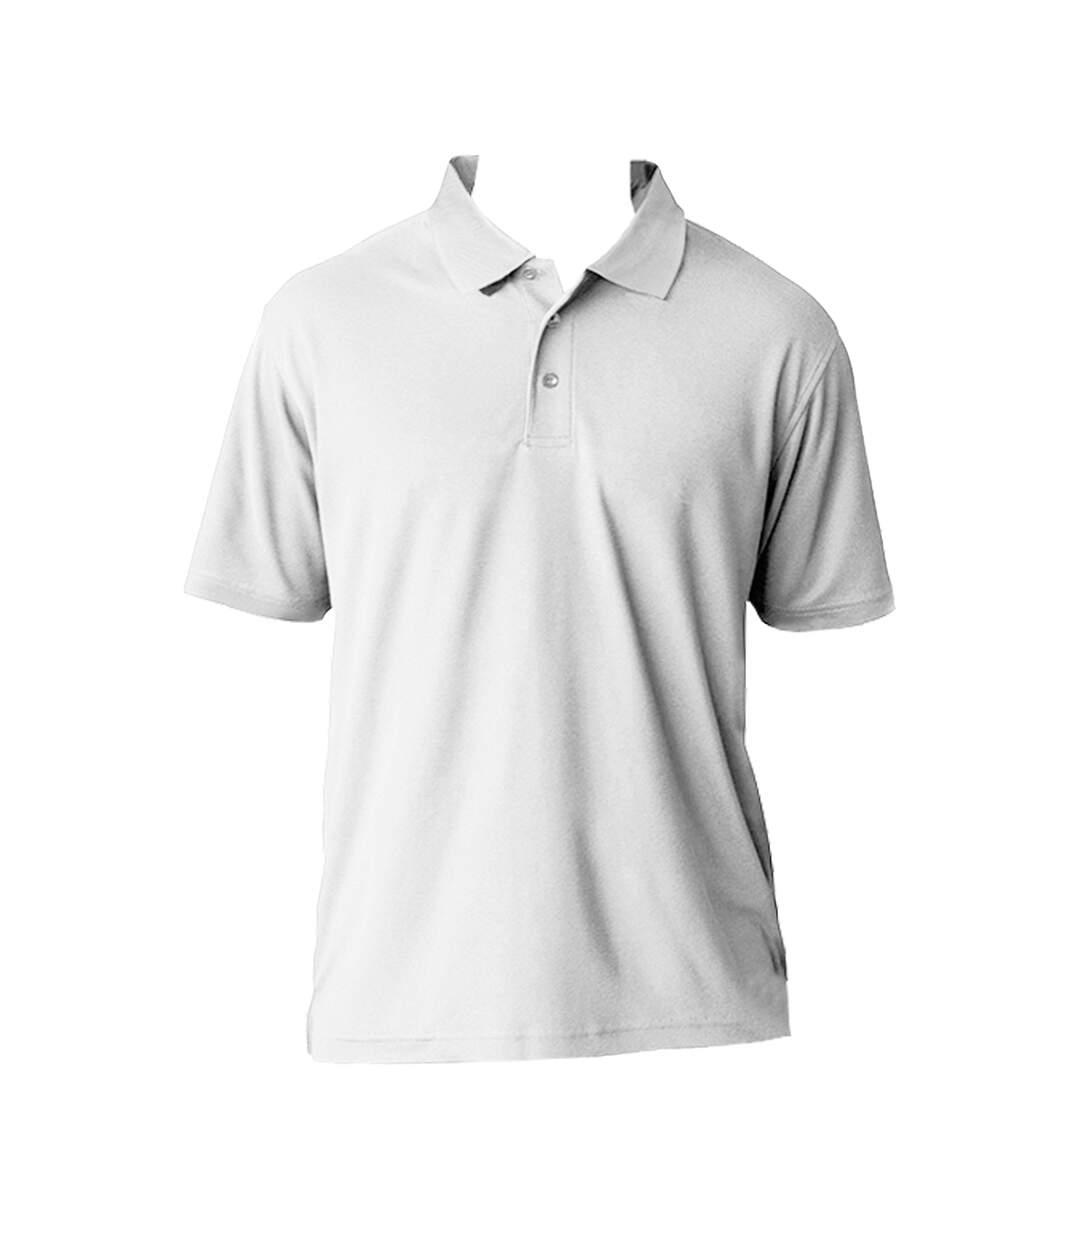 AWDis Cool Mens SuperCool Sports Performance Short Sleeve Polo Shirt (Arctic White) - UTRW2541